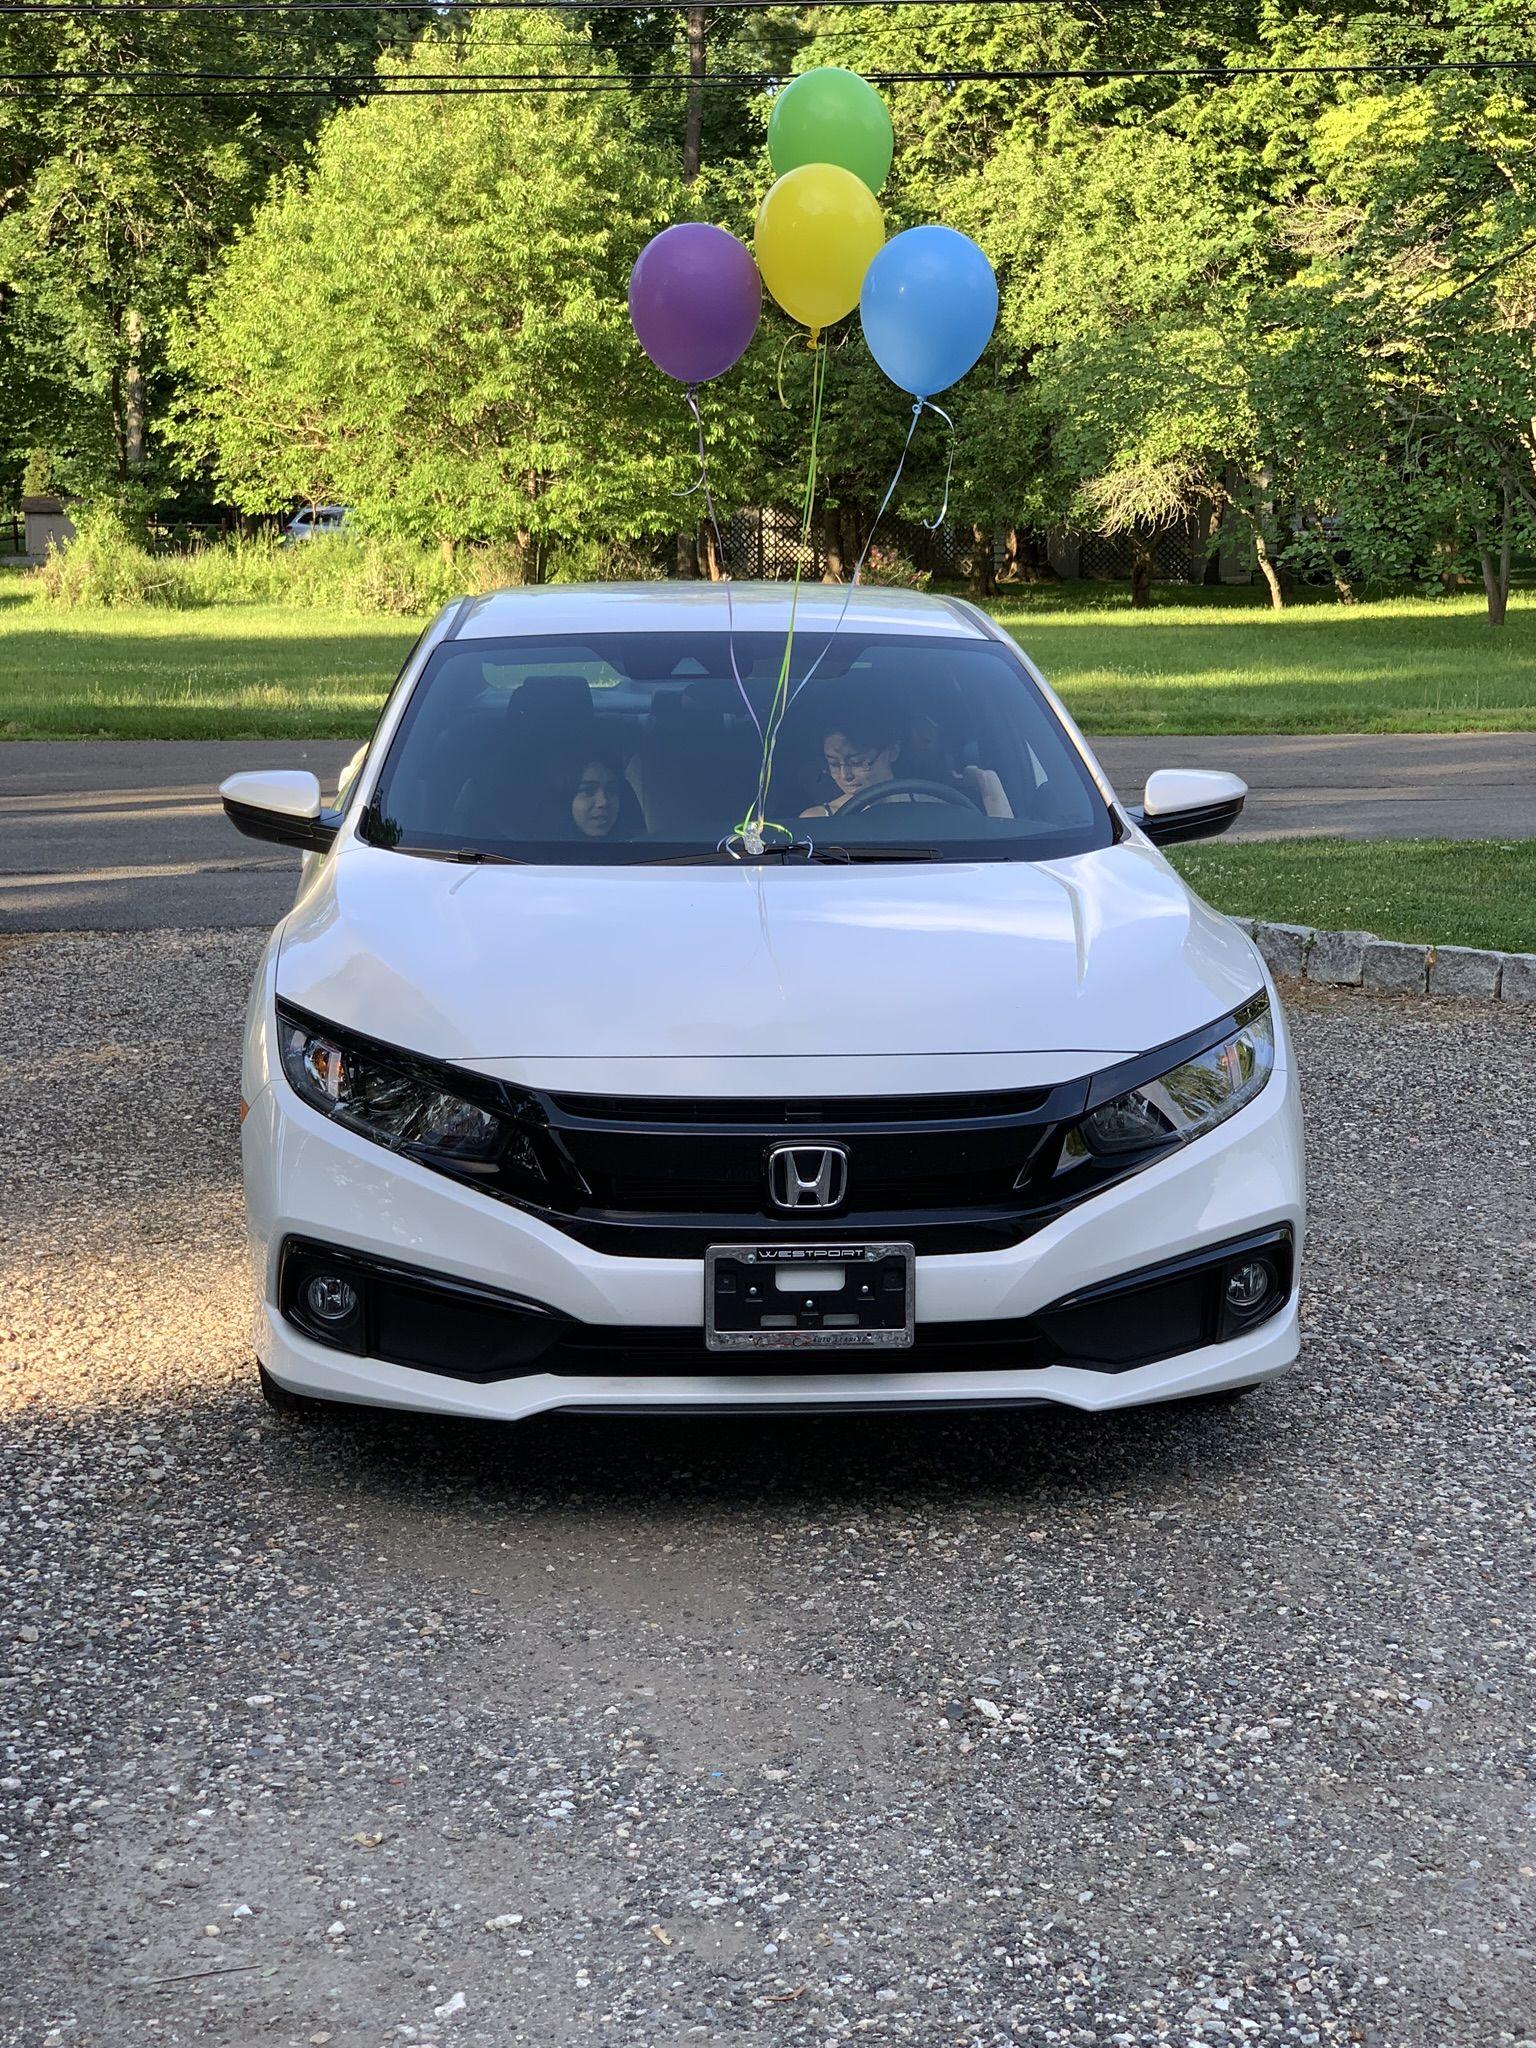 2019 Honda Civic Sedan Sport Civic Sedan Honda Civic Sedan Car Lease